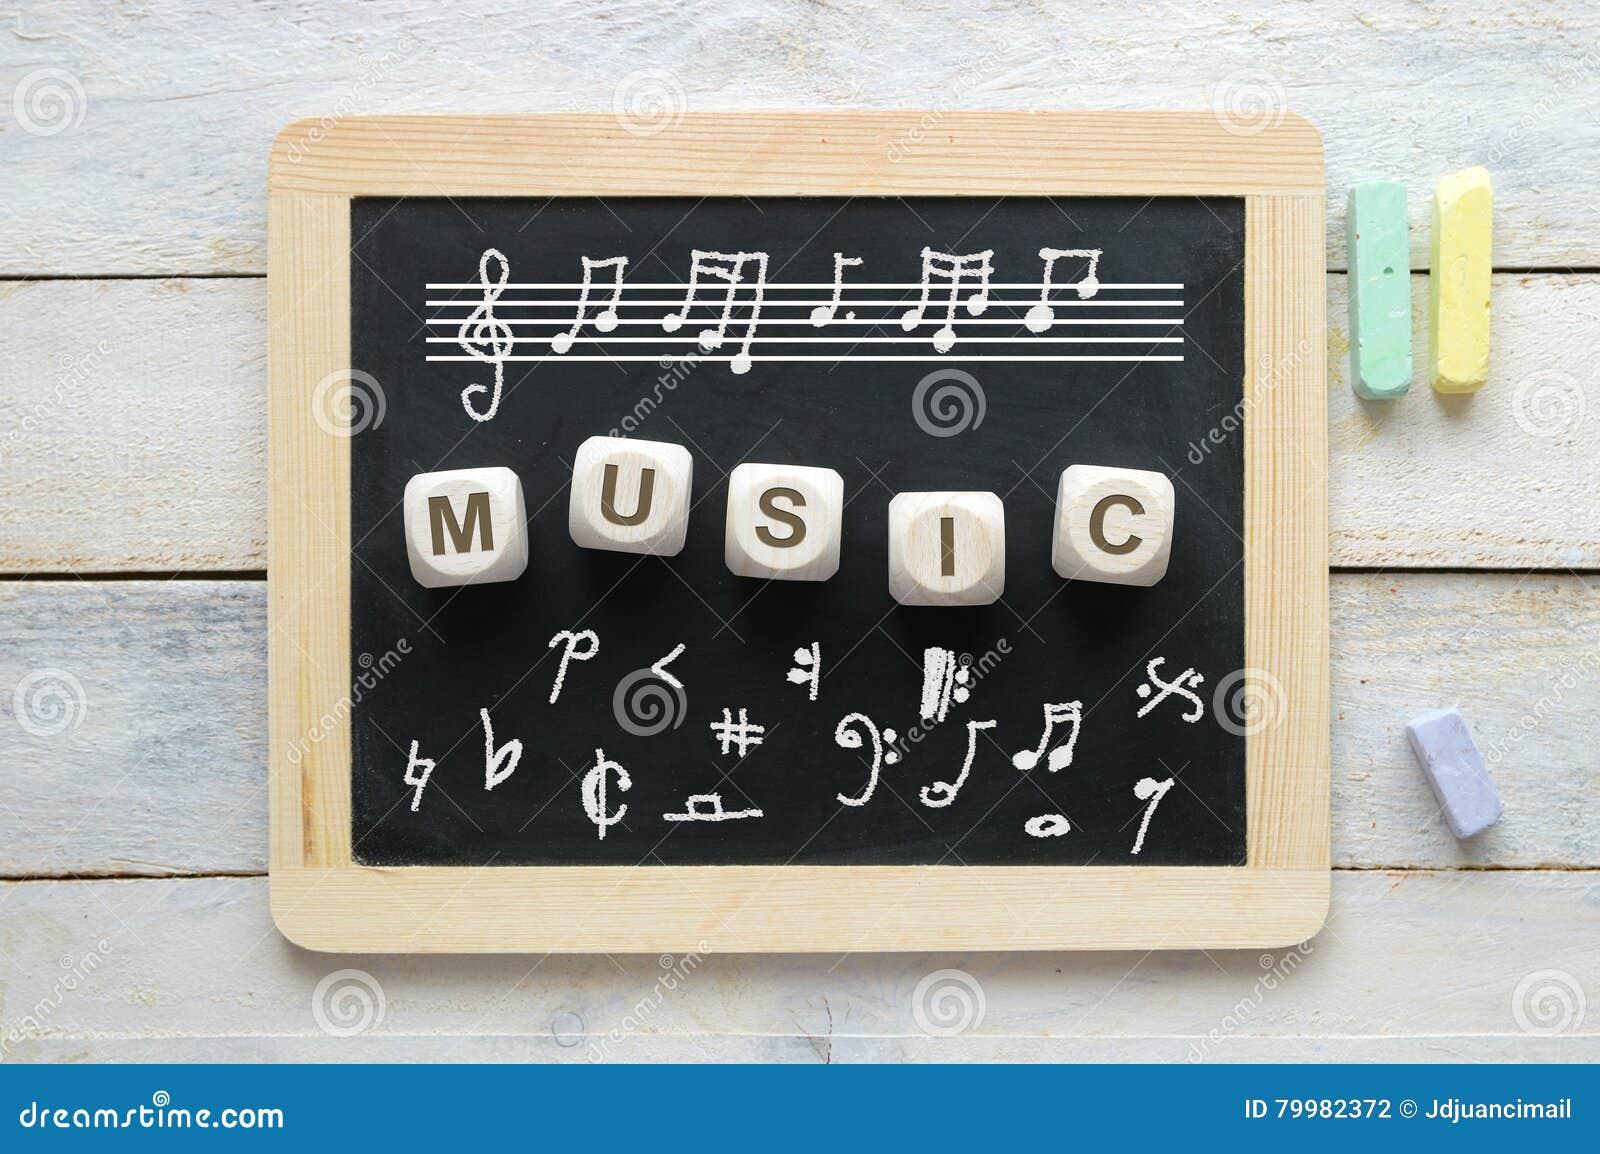 Blackboard Innovative Classroom ~ Blackboard in a music classroom with some notation symbols